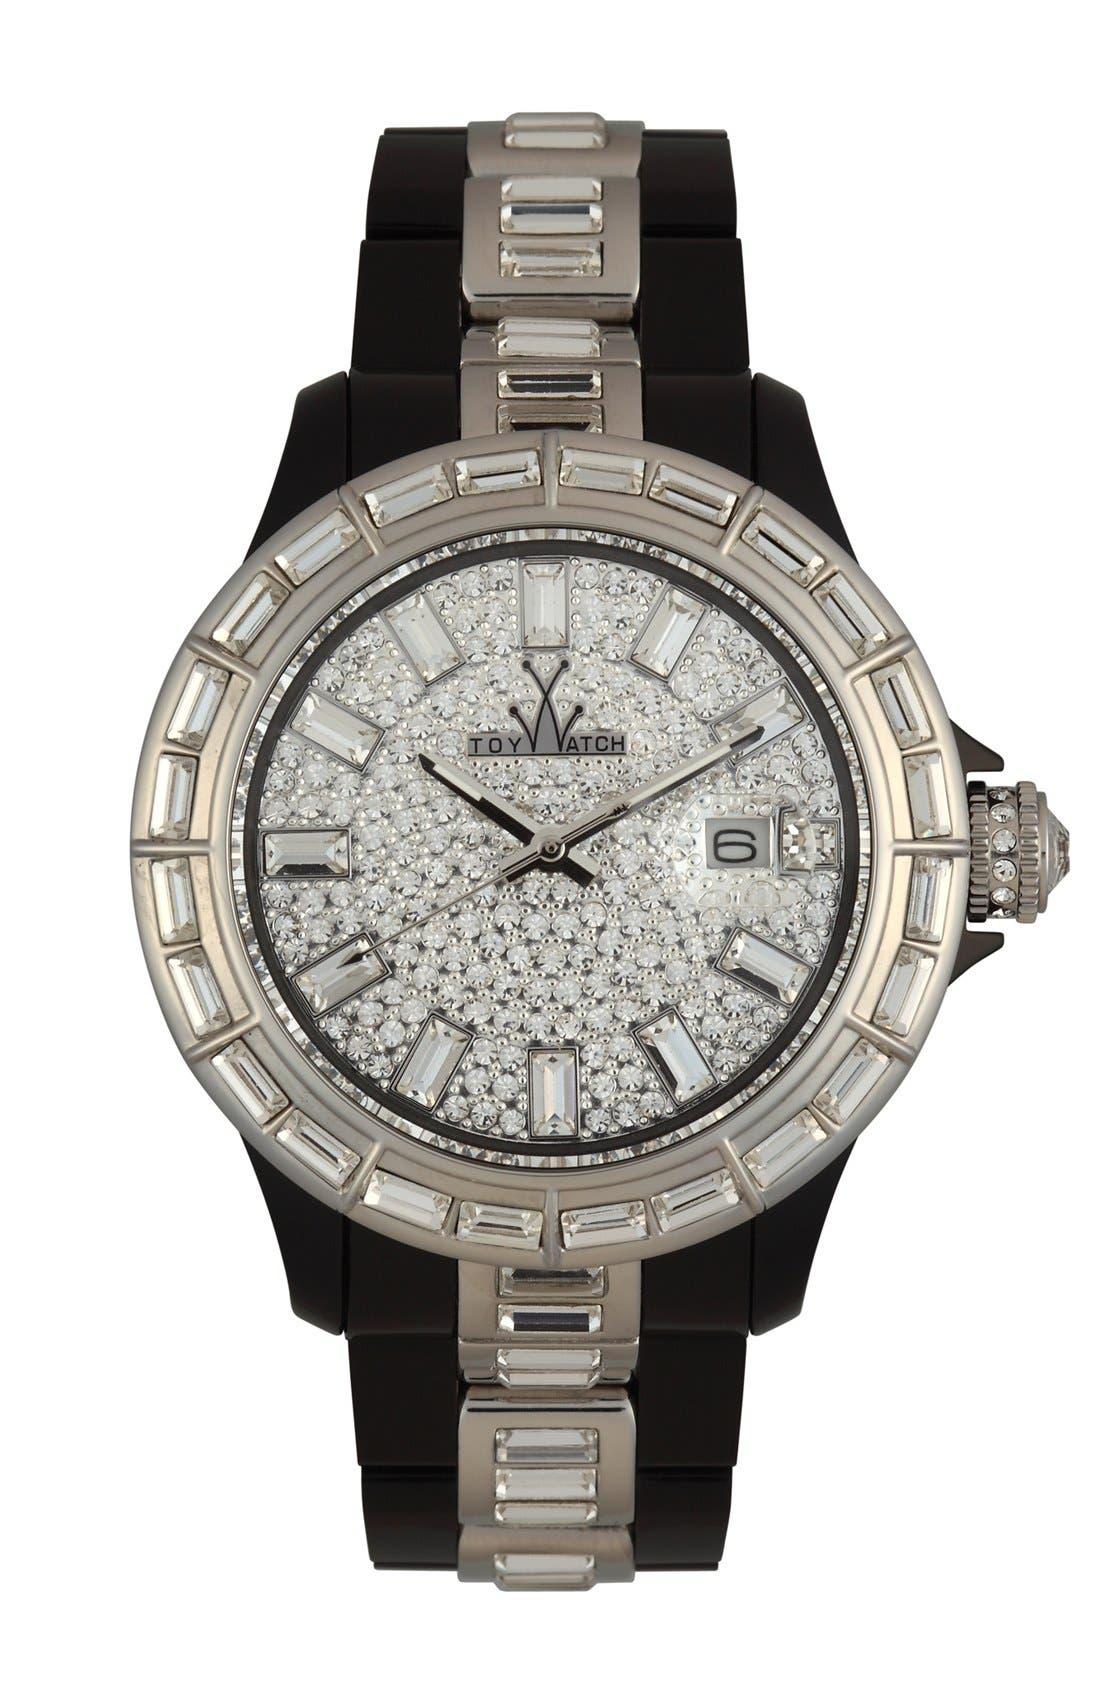 Main Image - TOYWATCH 'Gems' Bracelet Watch, 41mm